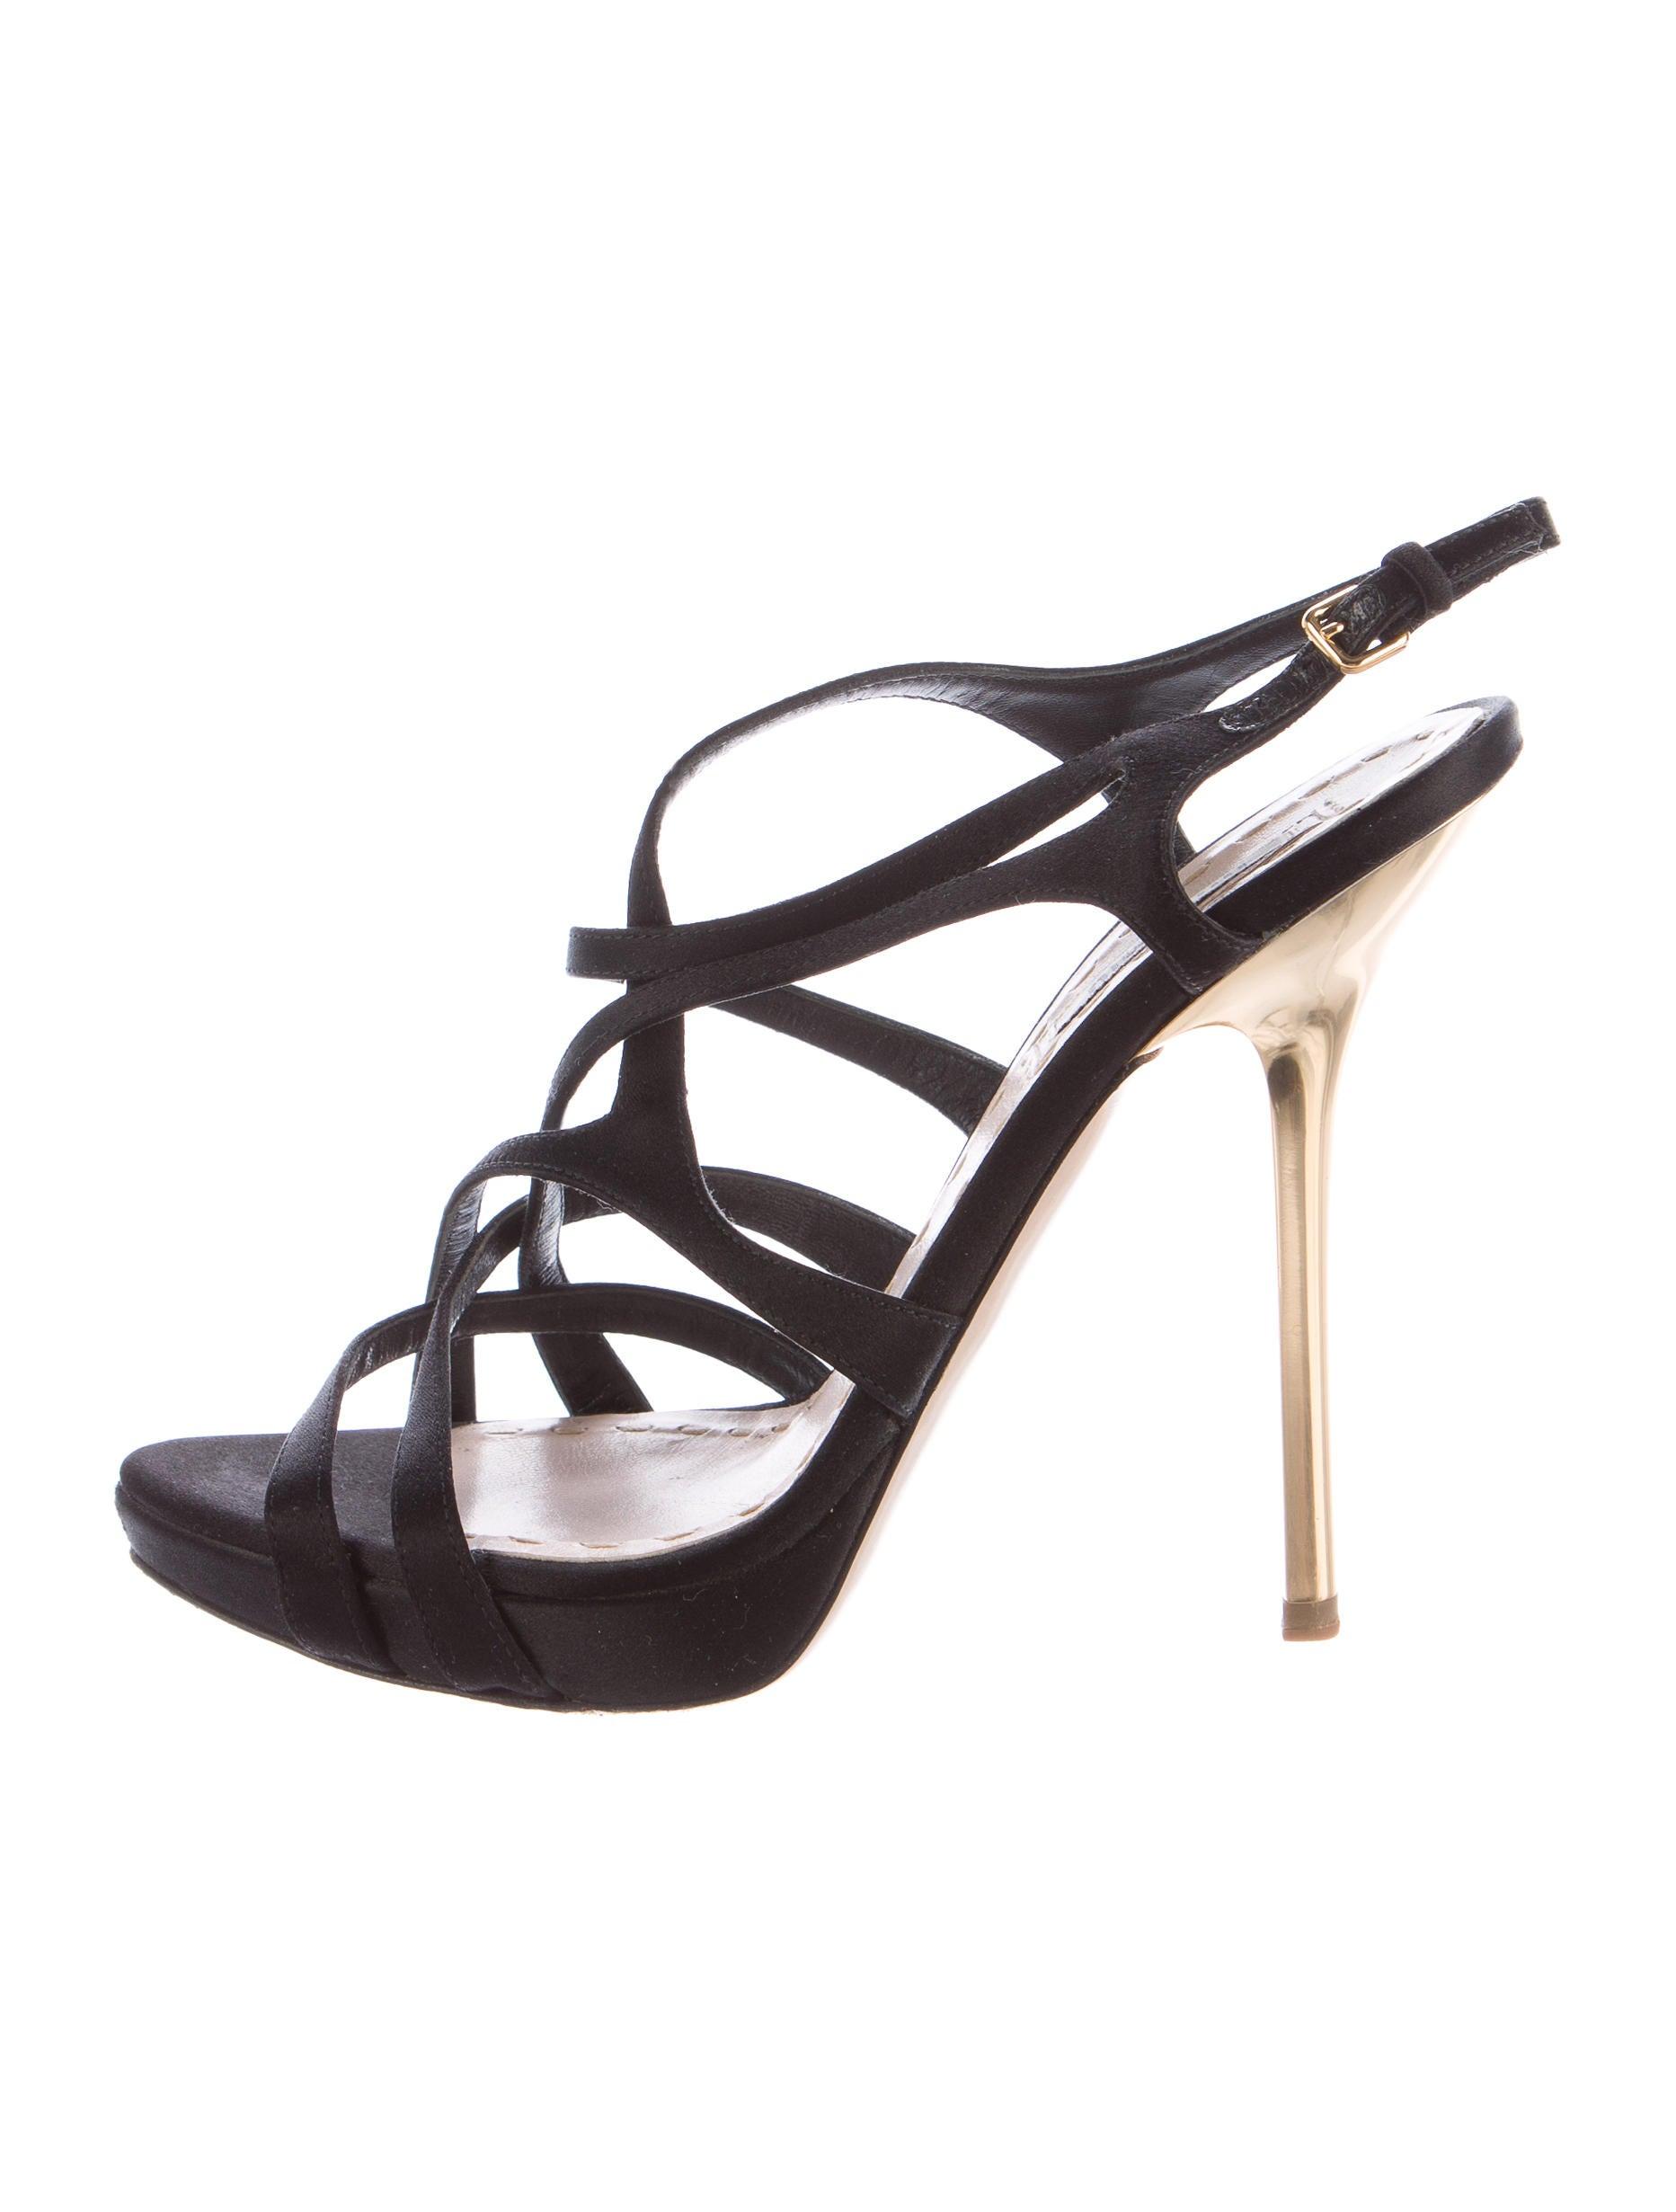 Miu Miu Satin Platform Cage Sandals - Shoes